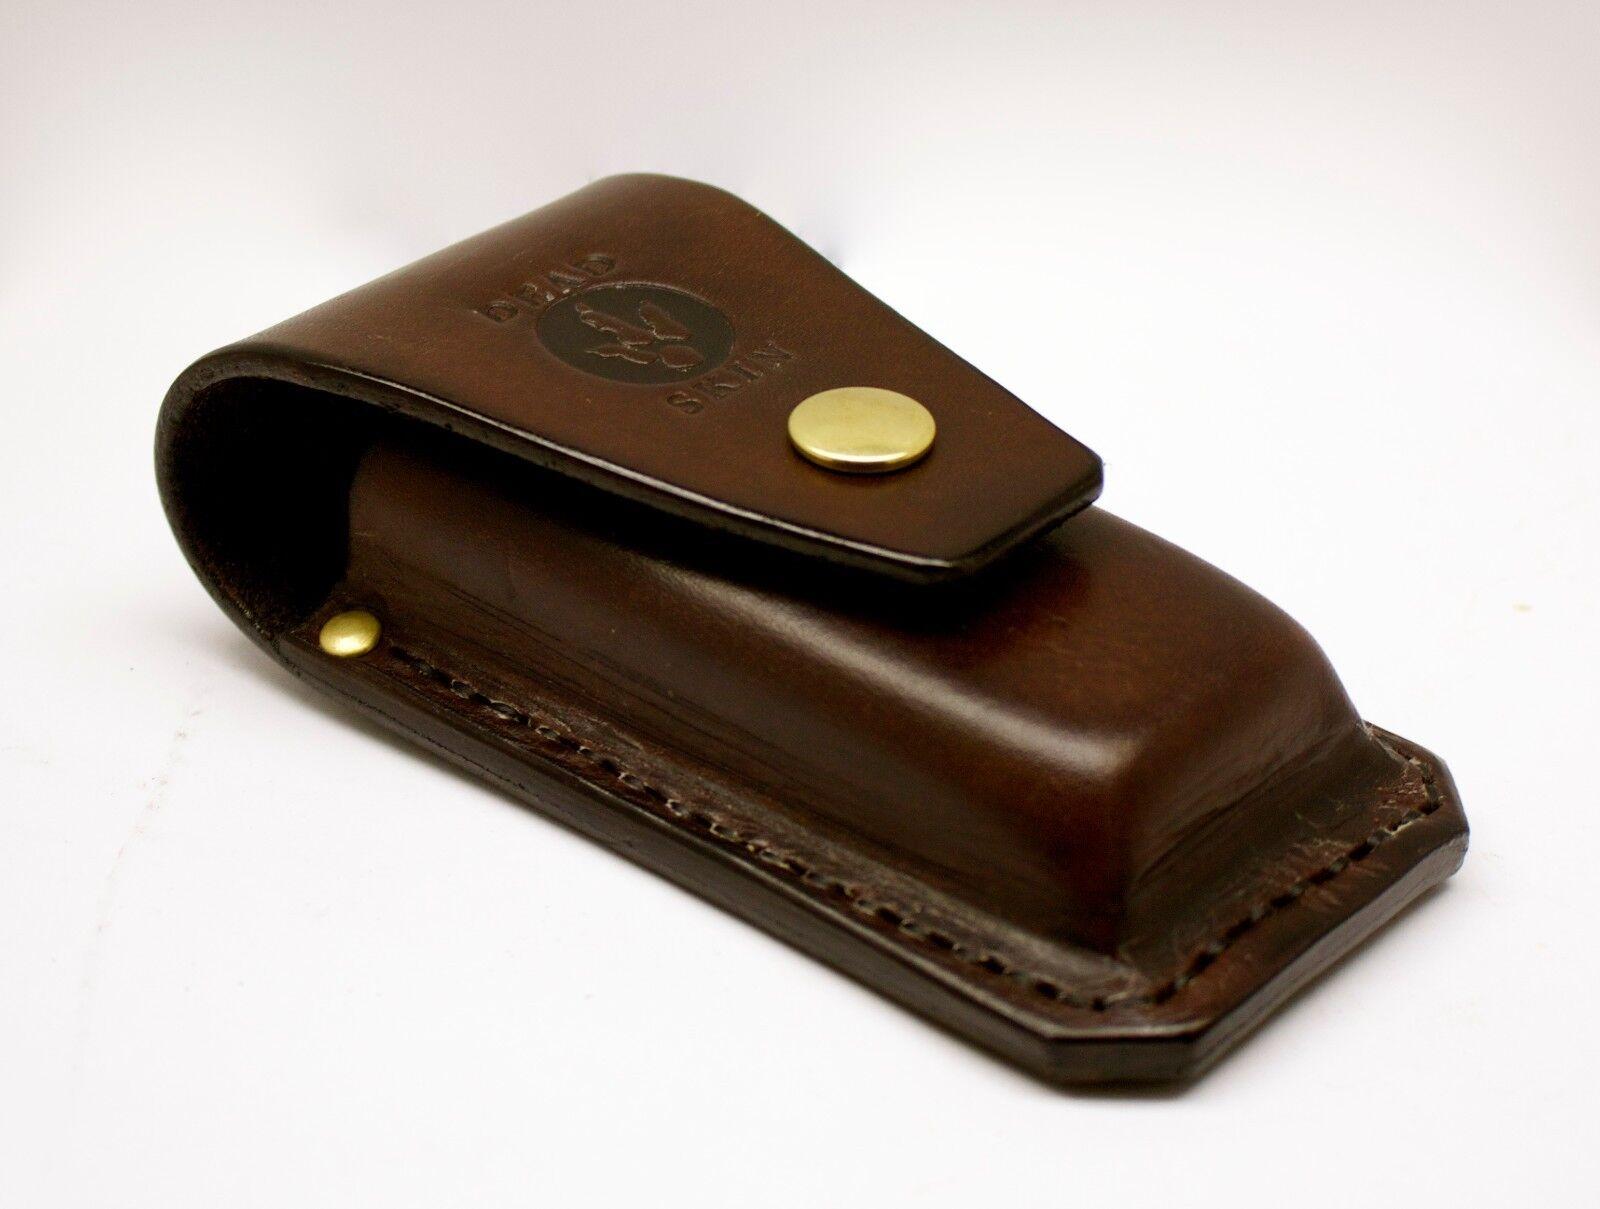 Braun Leder pouch for Lederman multitool SURGE 300 handmade by Deadskin Deadskin by AU 0263d0